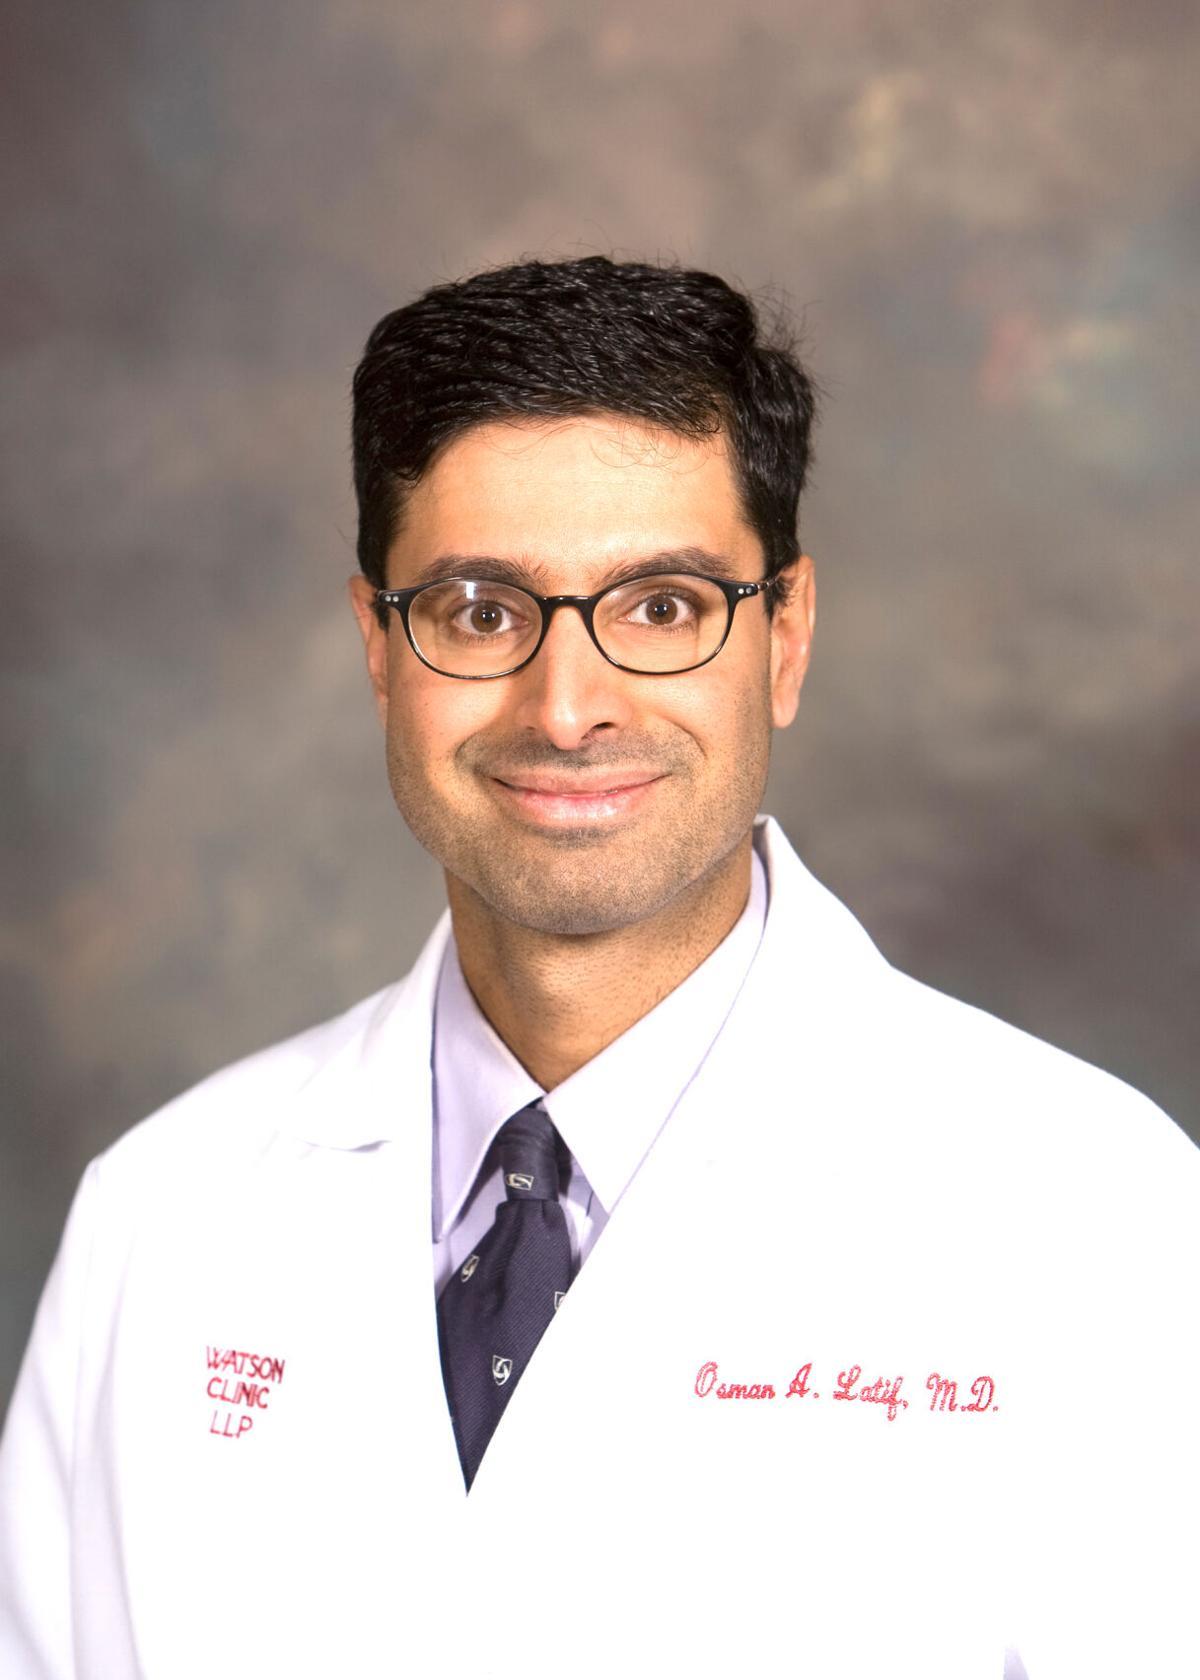 Dr Osman Latif headshot